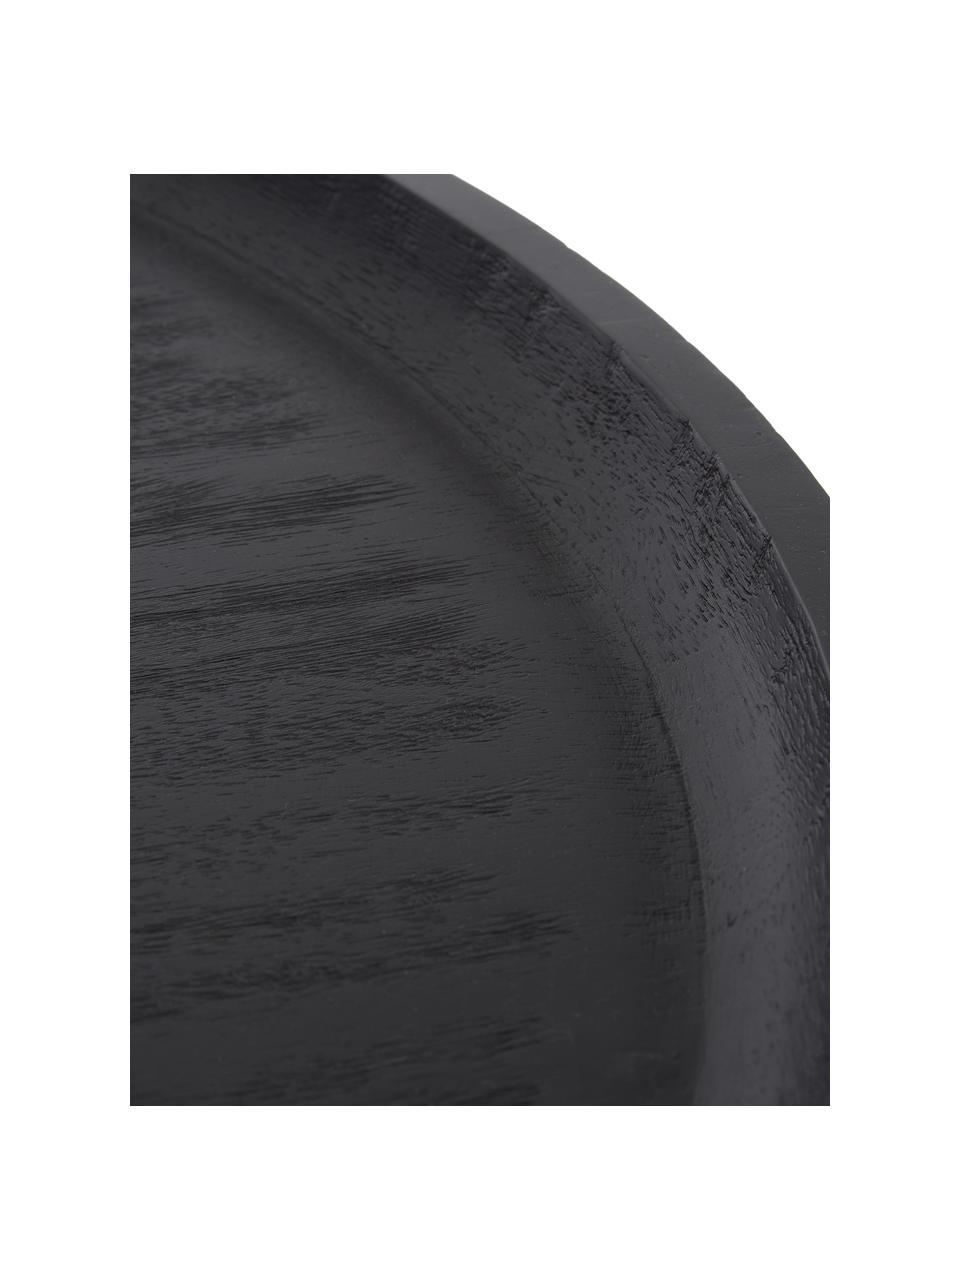 Salontafel Benno van mangohout in zwart, Massief gelakt essenhout, Zwart gelakt mangohout, Ø 80 x H 35 cm